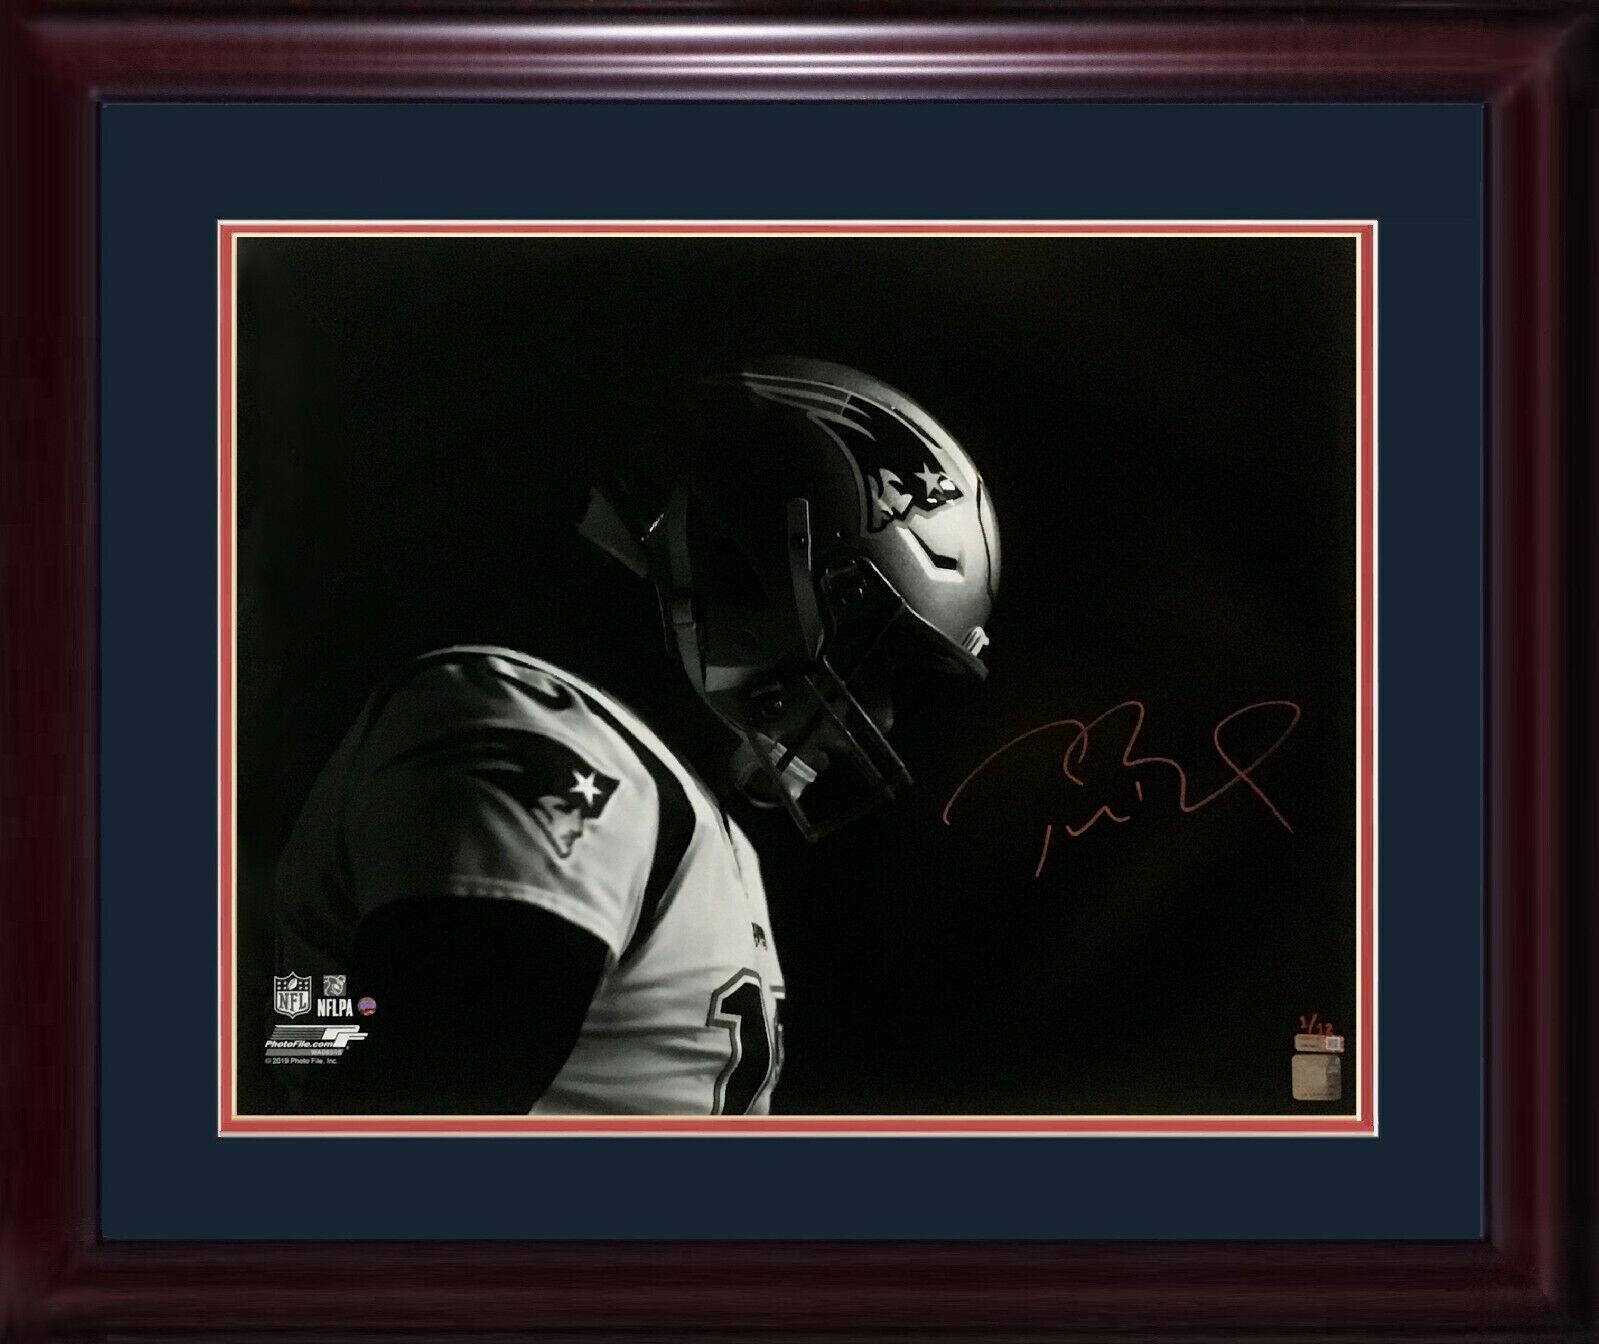 Tom Brady SB 51 MVP signed 20×24 photo framed mint auto Steiner Tristar COA 1/12